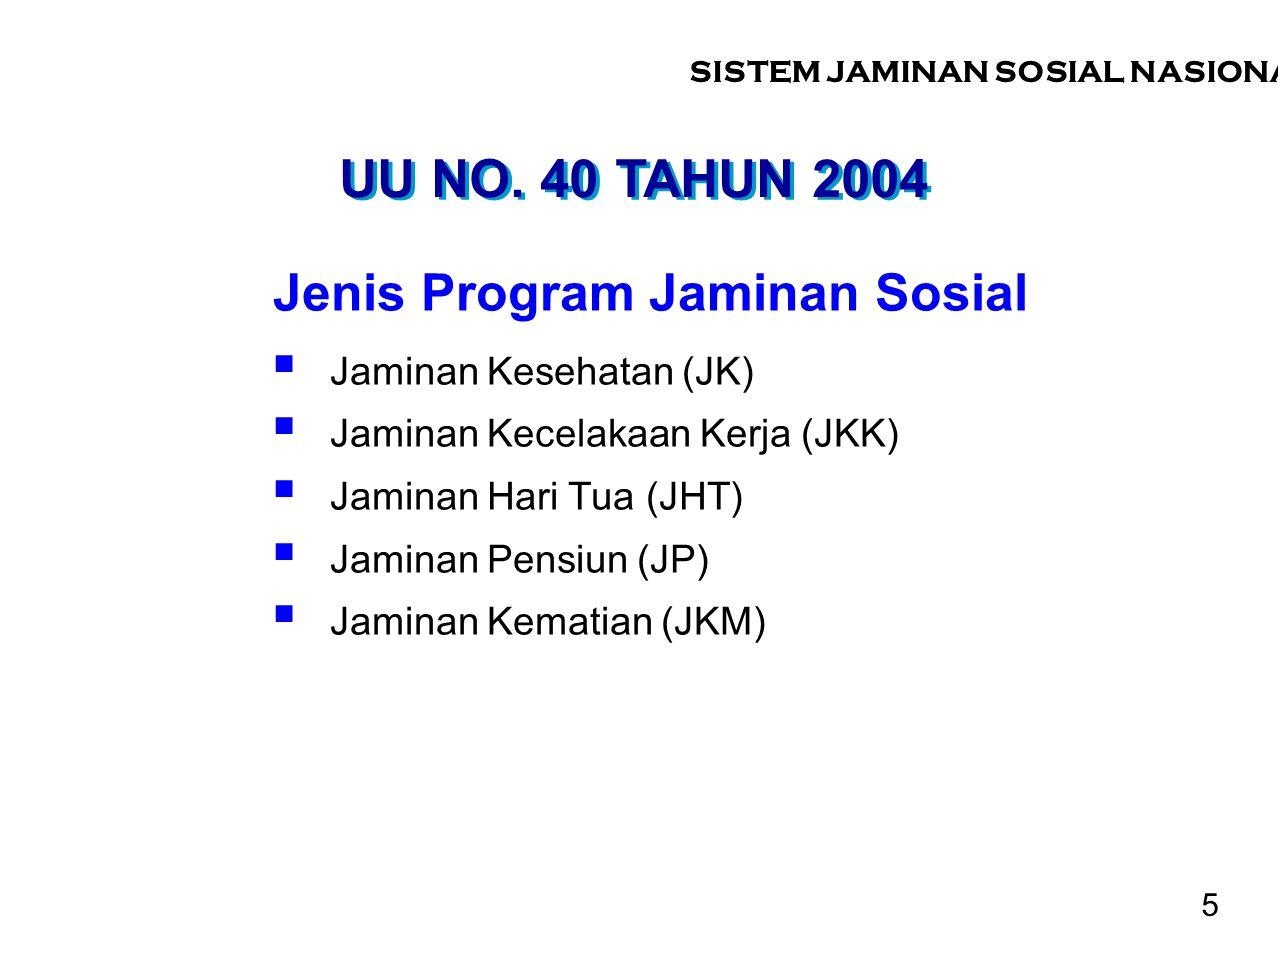 UU NO. 40 TAHUN 2004 Jenis Program Jaminan Sosial  Jaminan Kesehatan (JK)  Jaminan Kecelakaan Kerja (JKK)  Jaminan Hari Tua (JHT)  Jaminan Pensiun